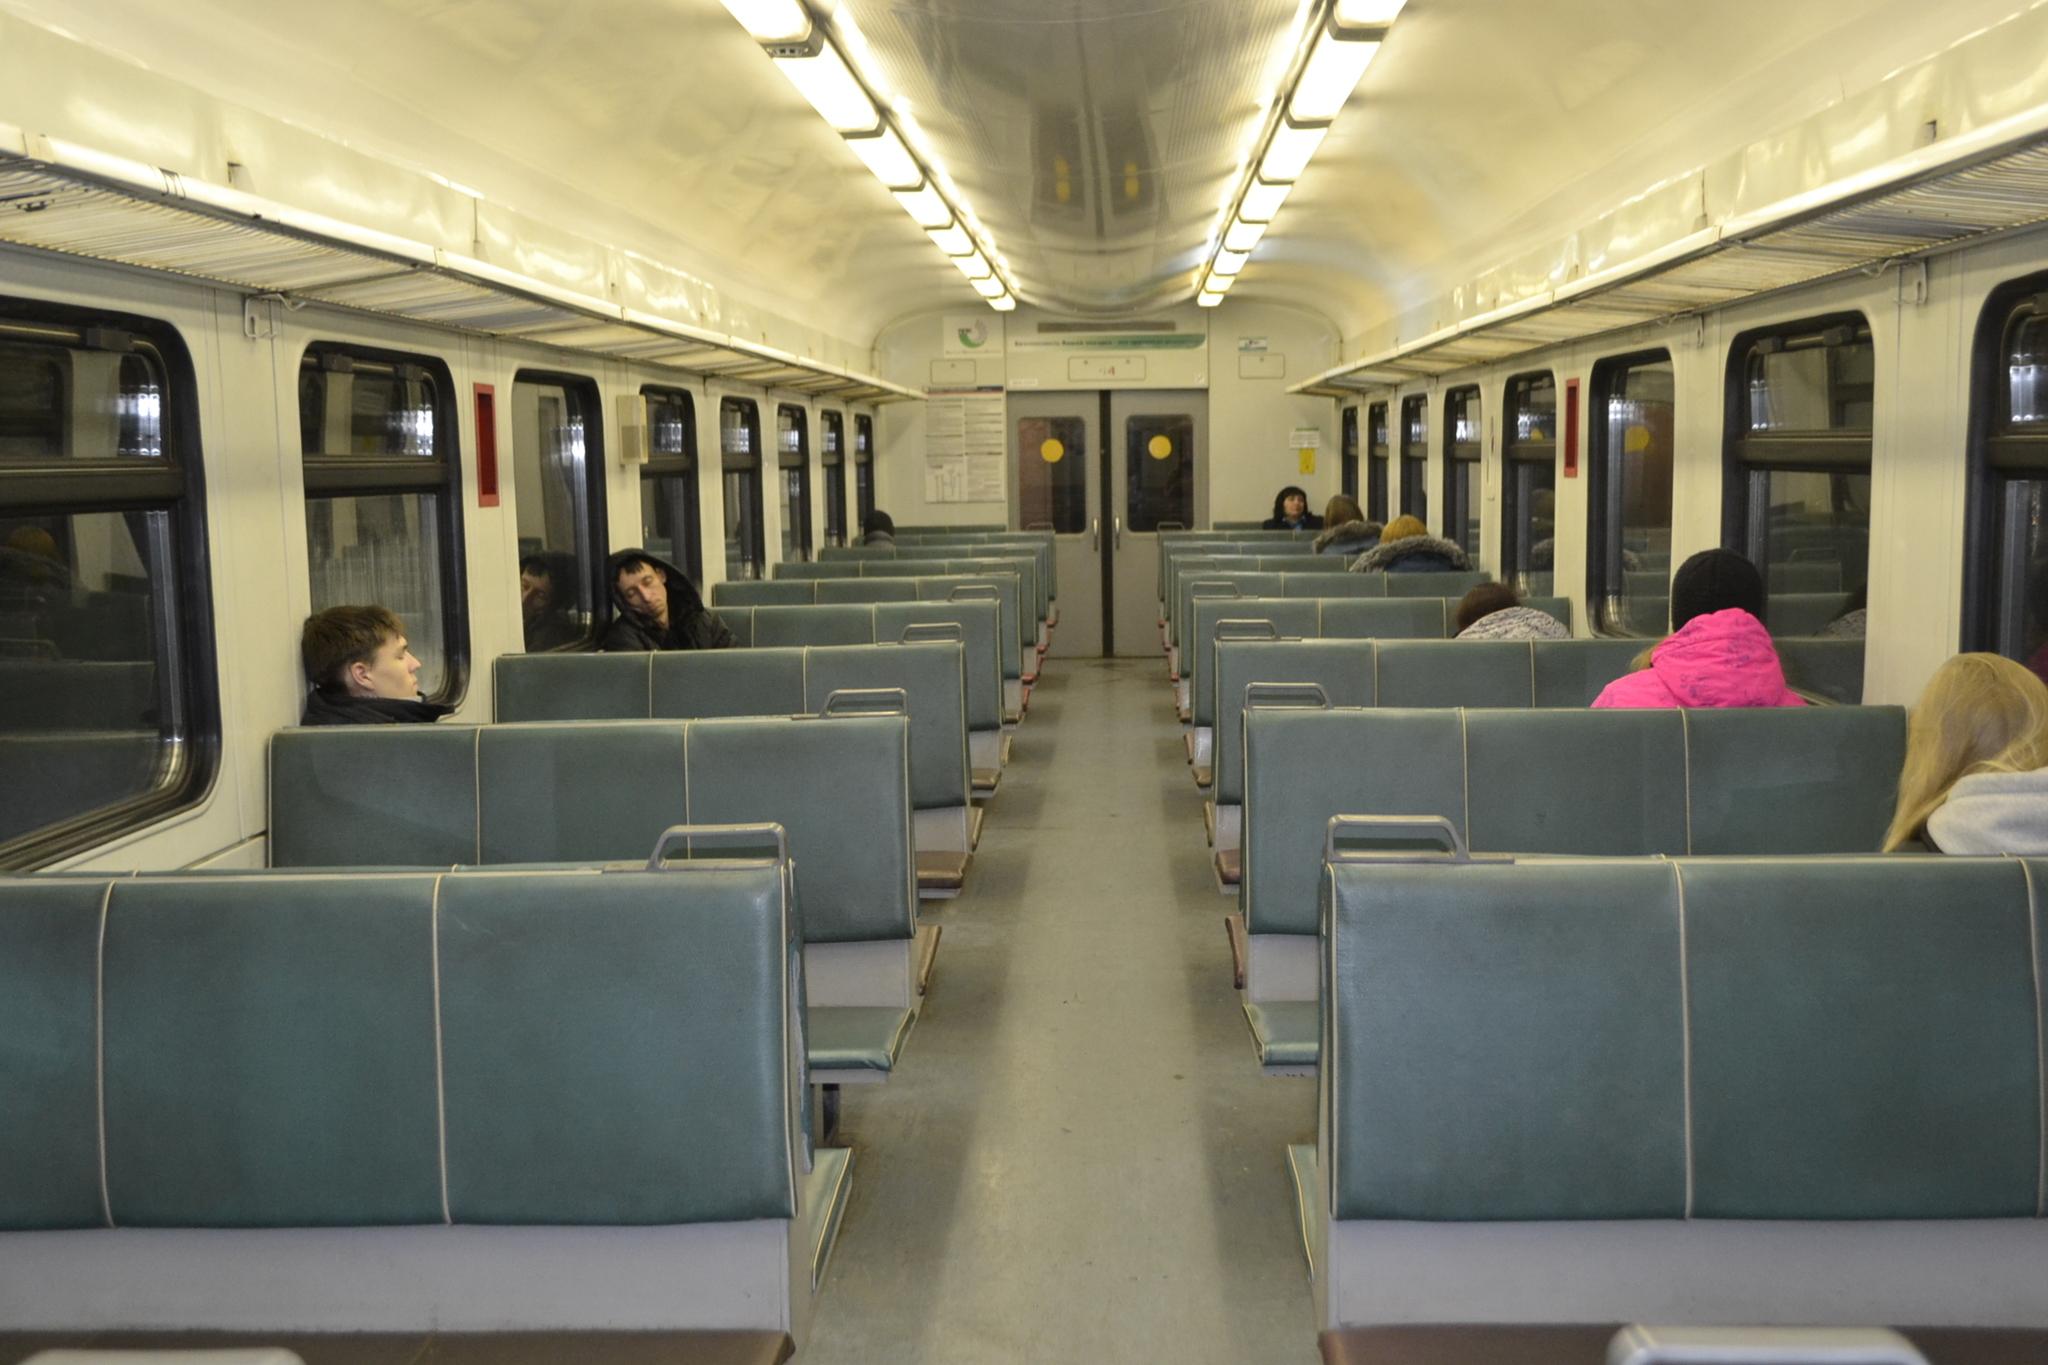 Поезд балаково схема сидячего вагона